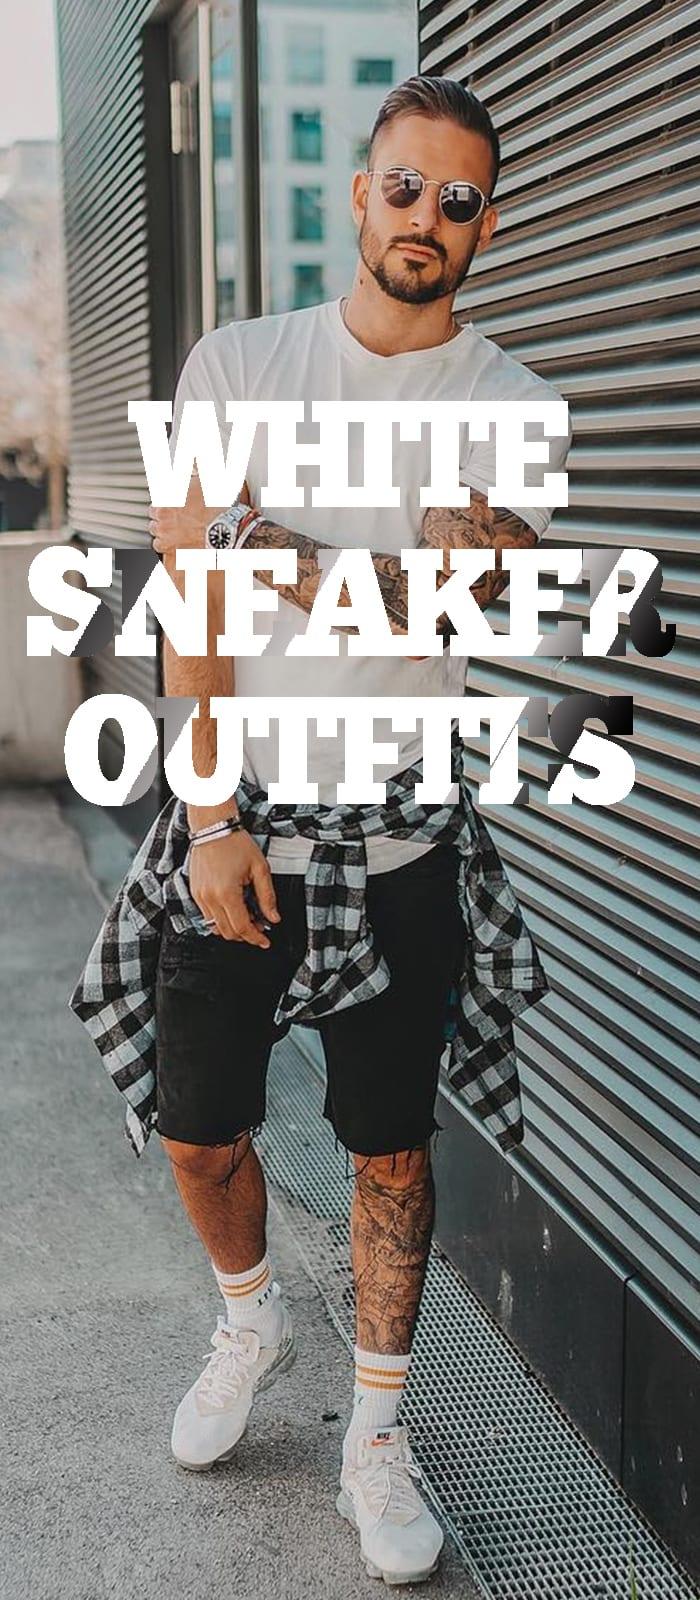 White T-shirt Black shorts,White sneakers